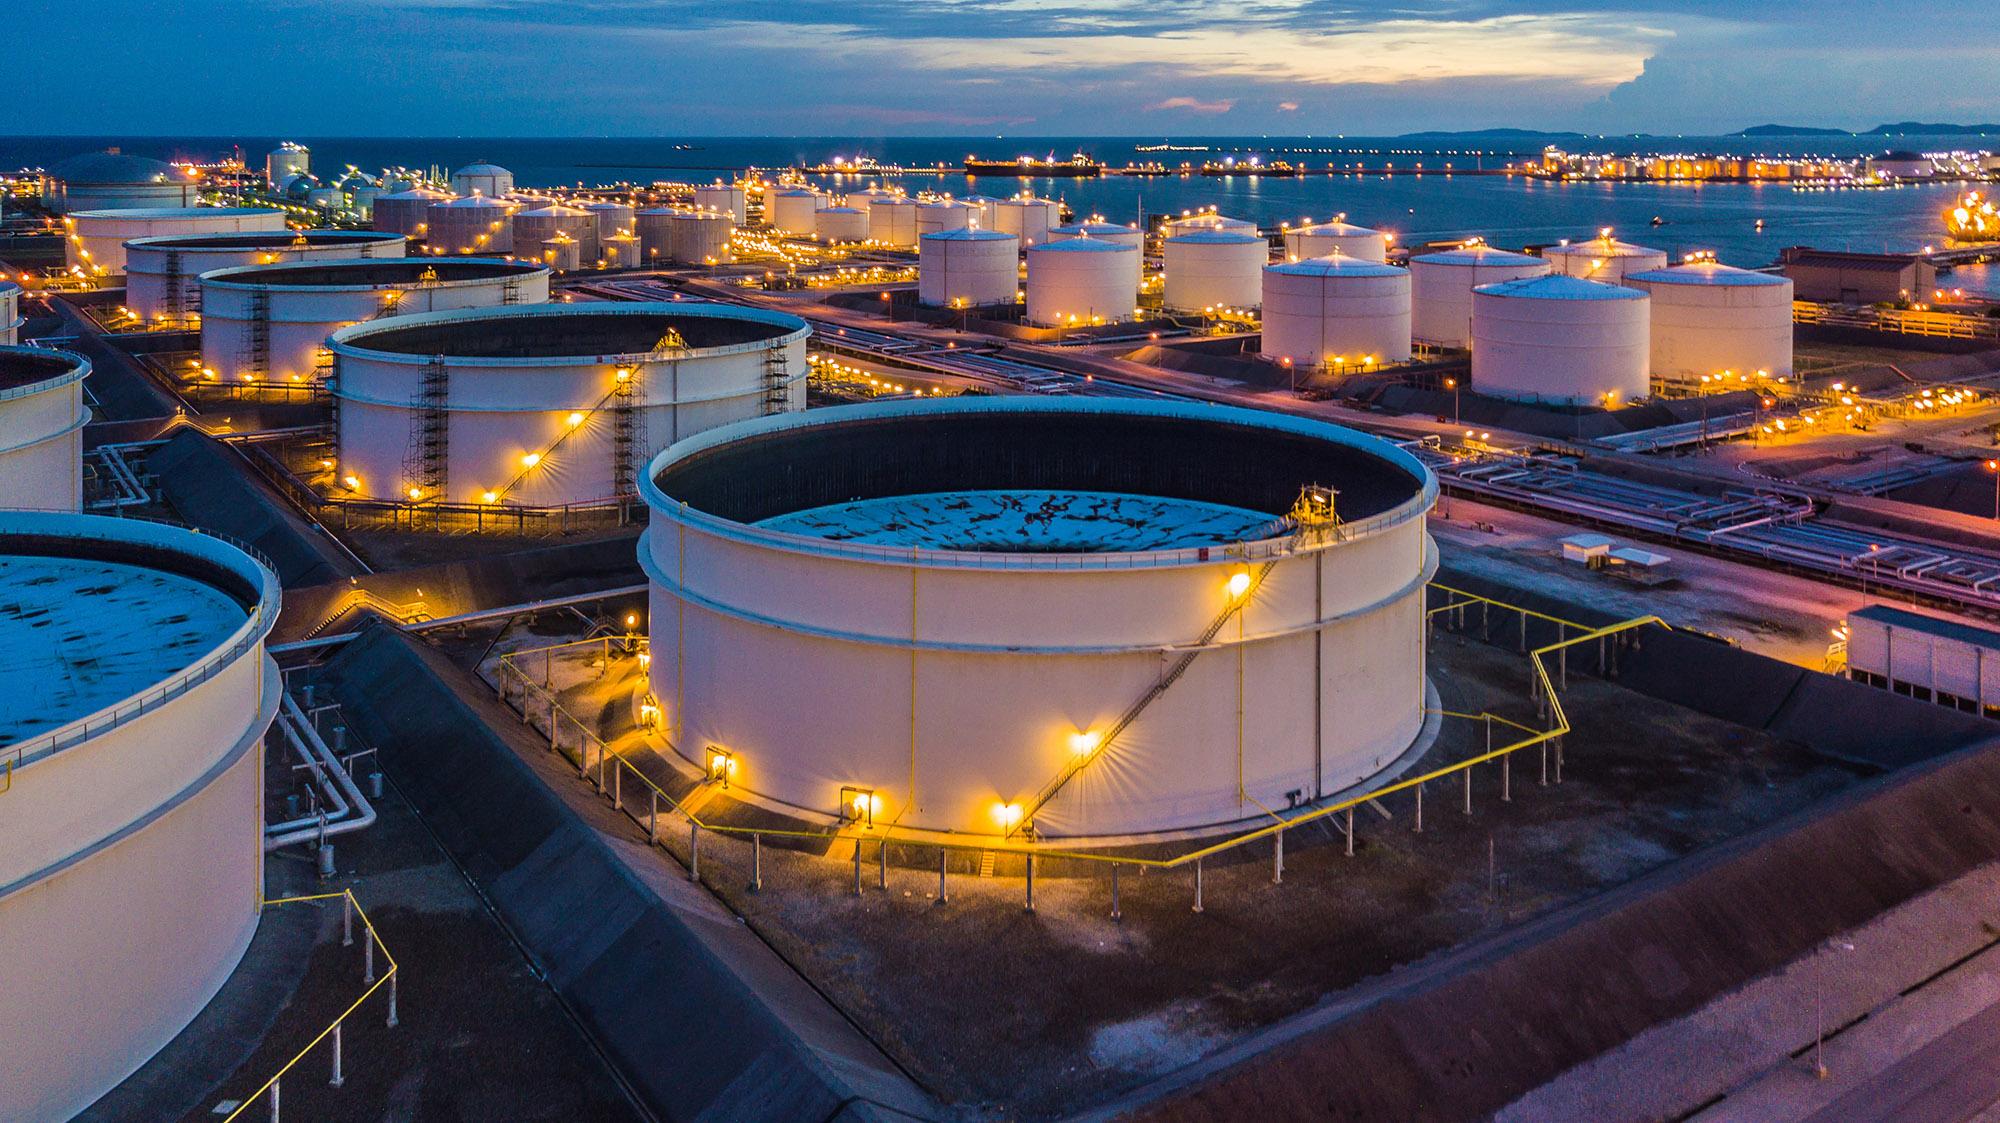 Chemical Company Saves 800k with a Vehicle Reimbursement Program